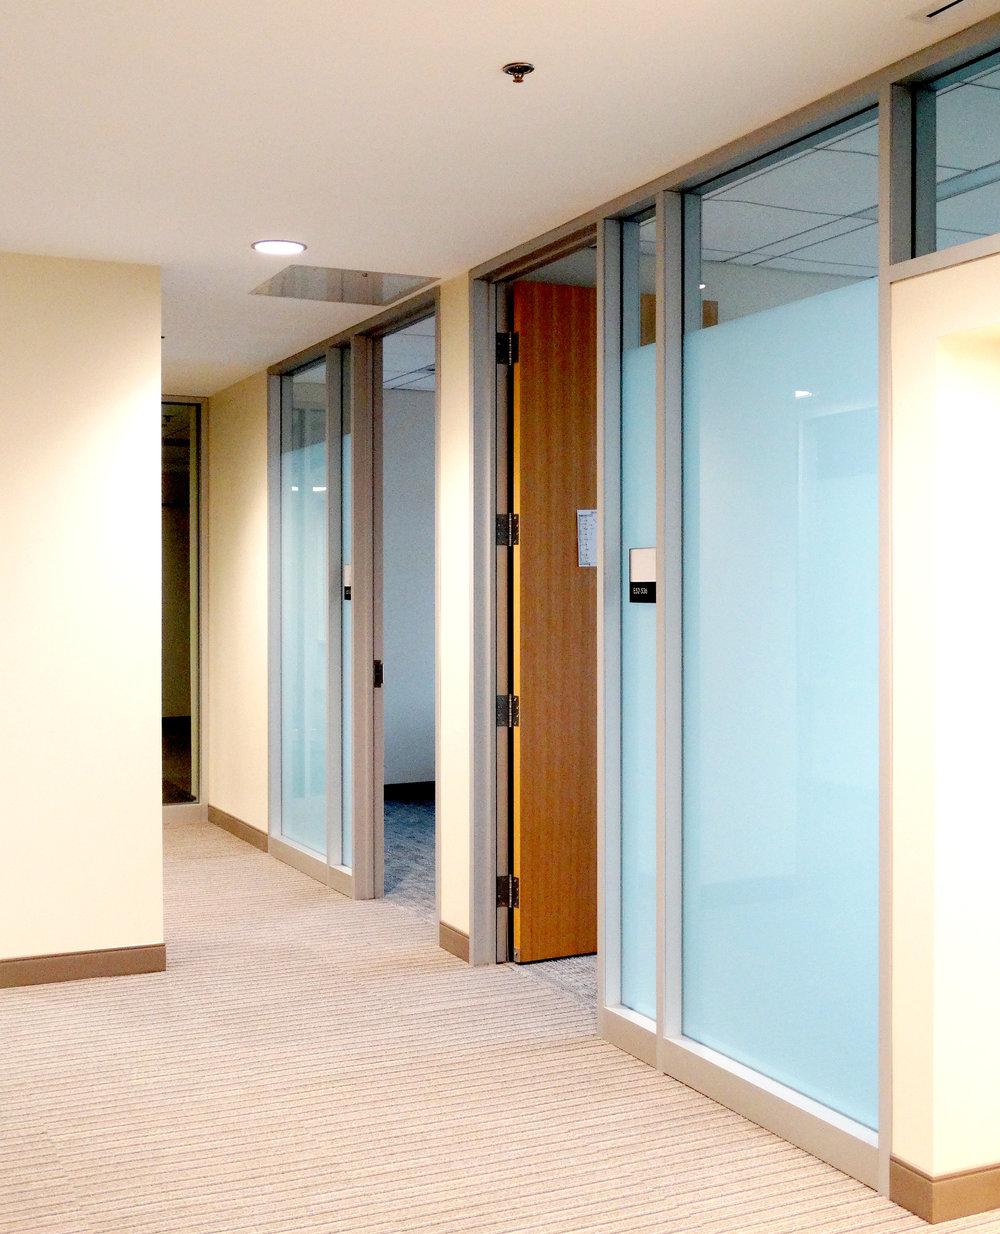 Encase Aluminum Framed Glass Wall Classroom Wood Door - Spaceworks AI.jpg